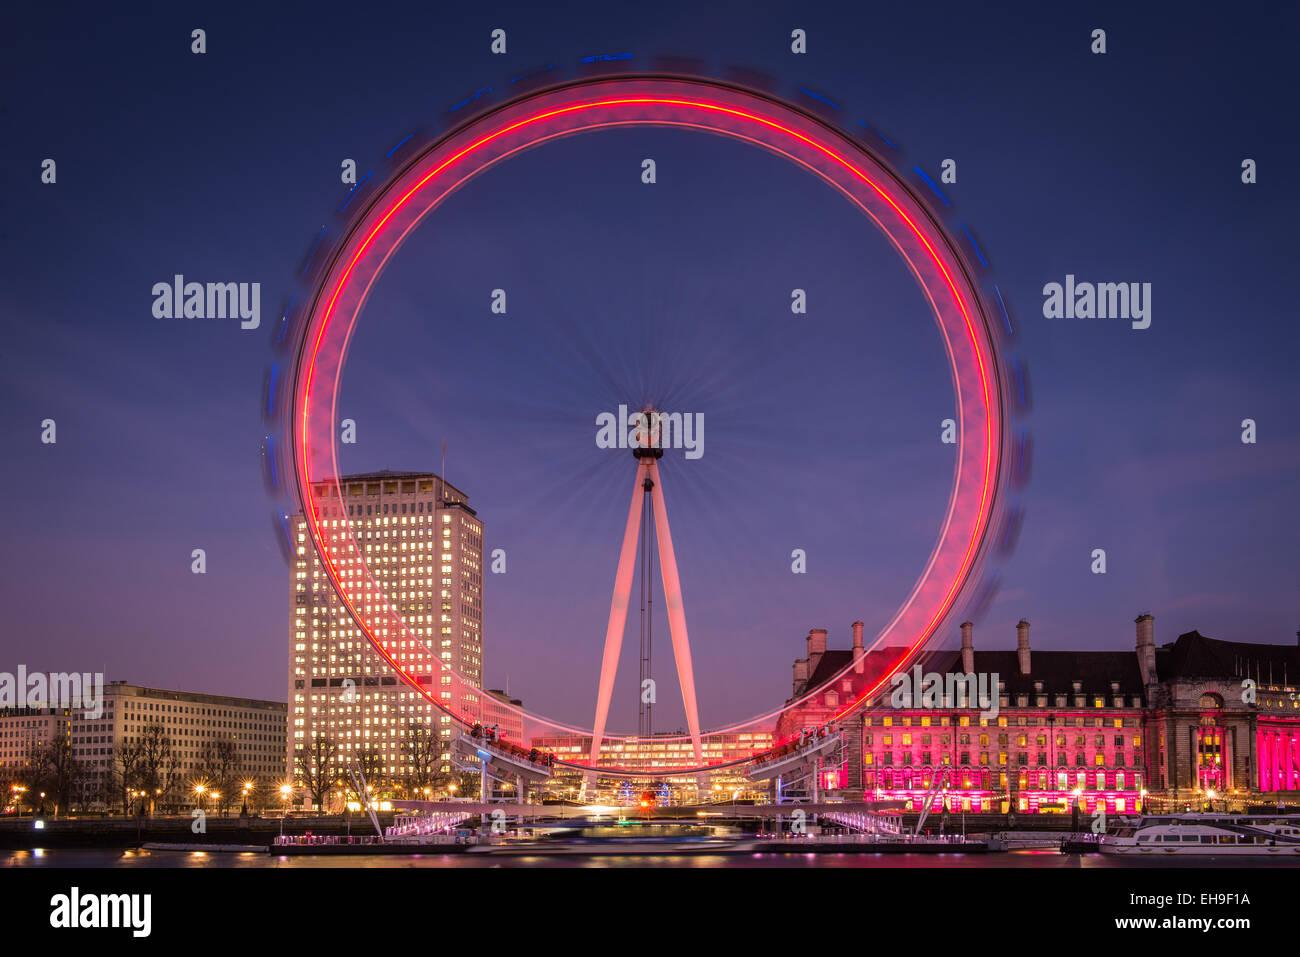 London Eye, London Photo Stock